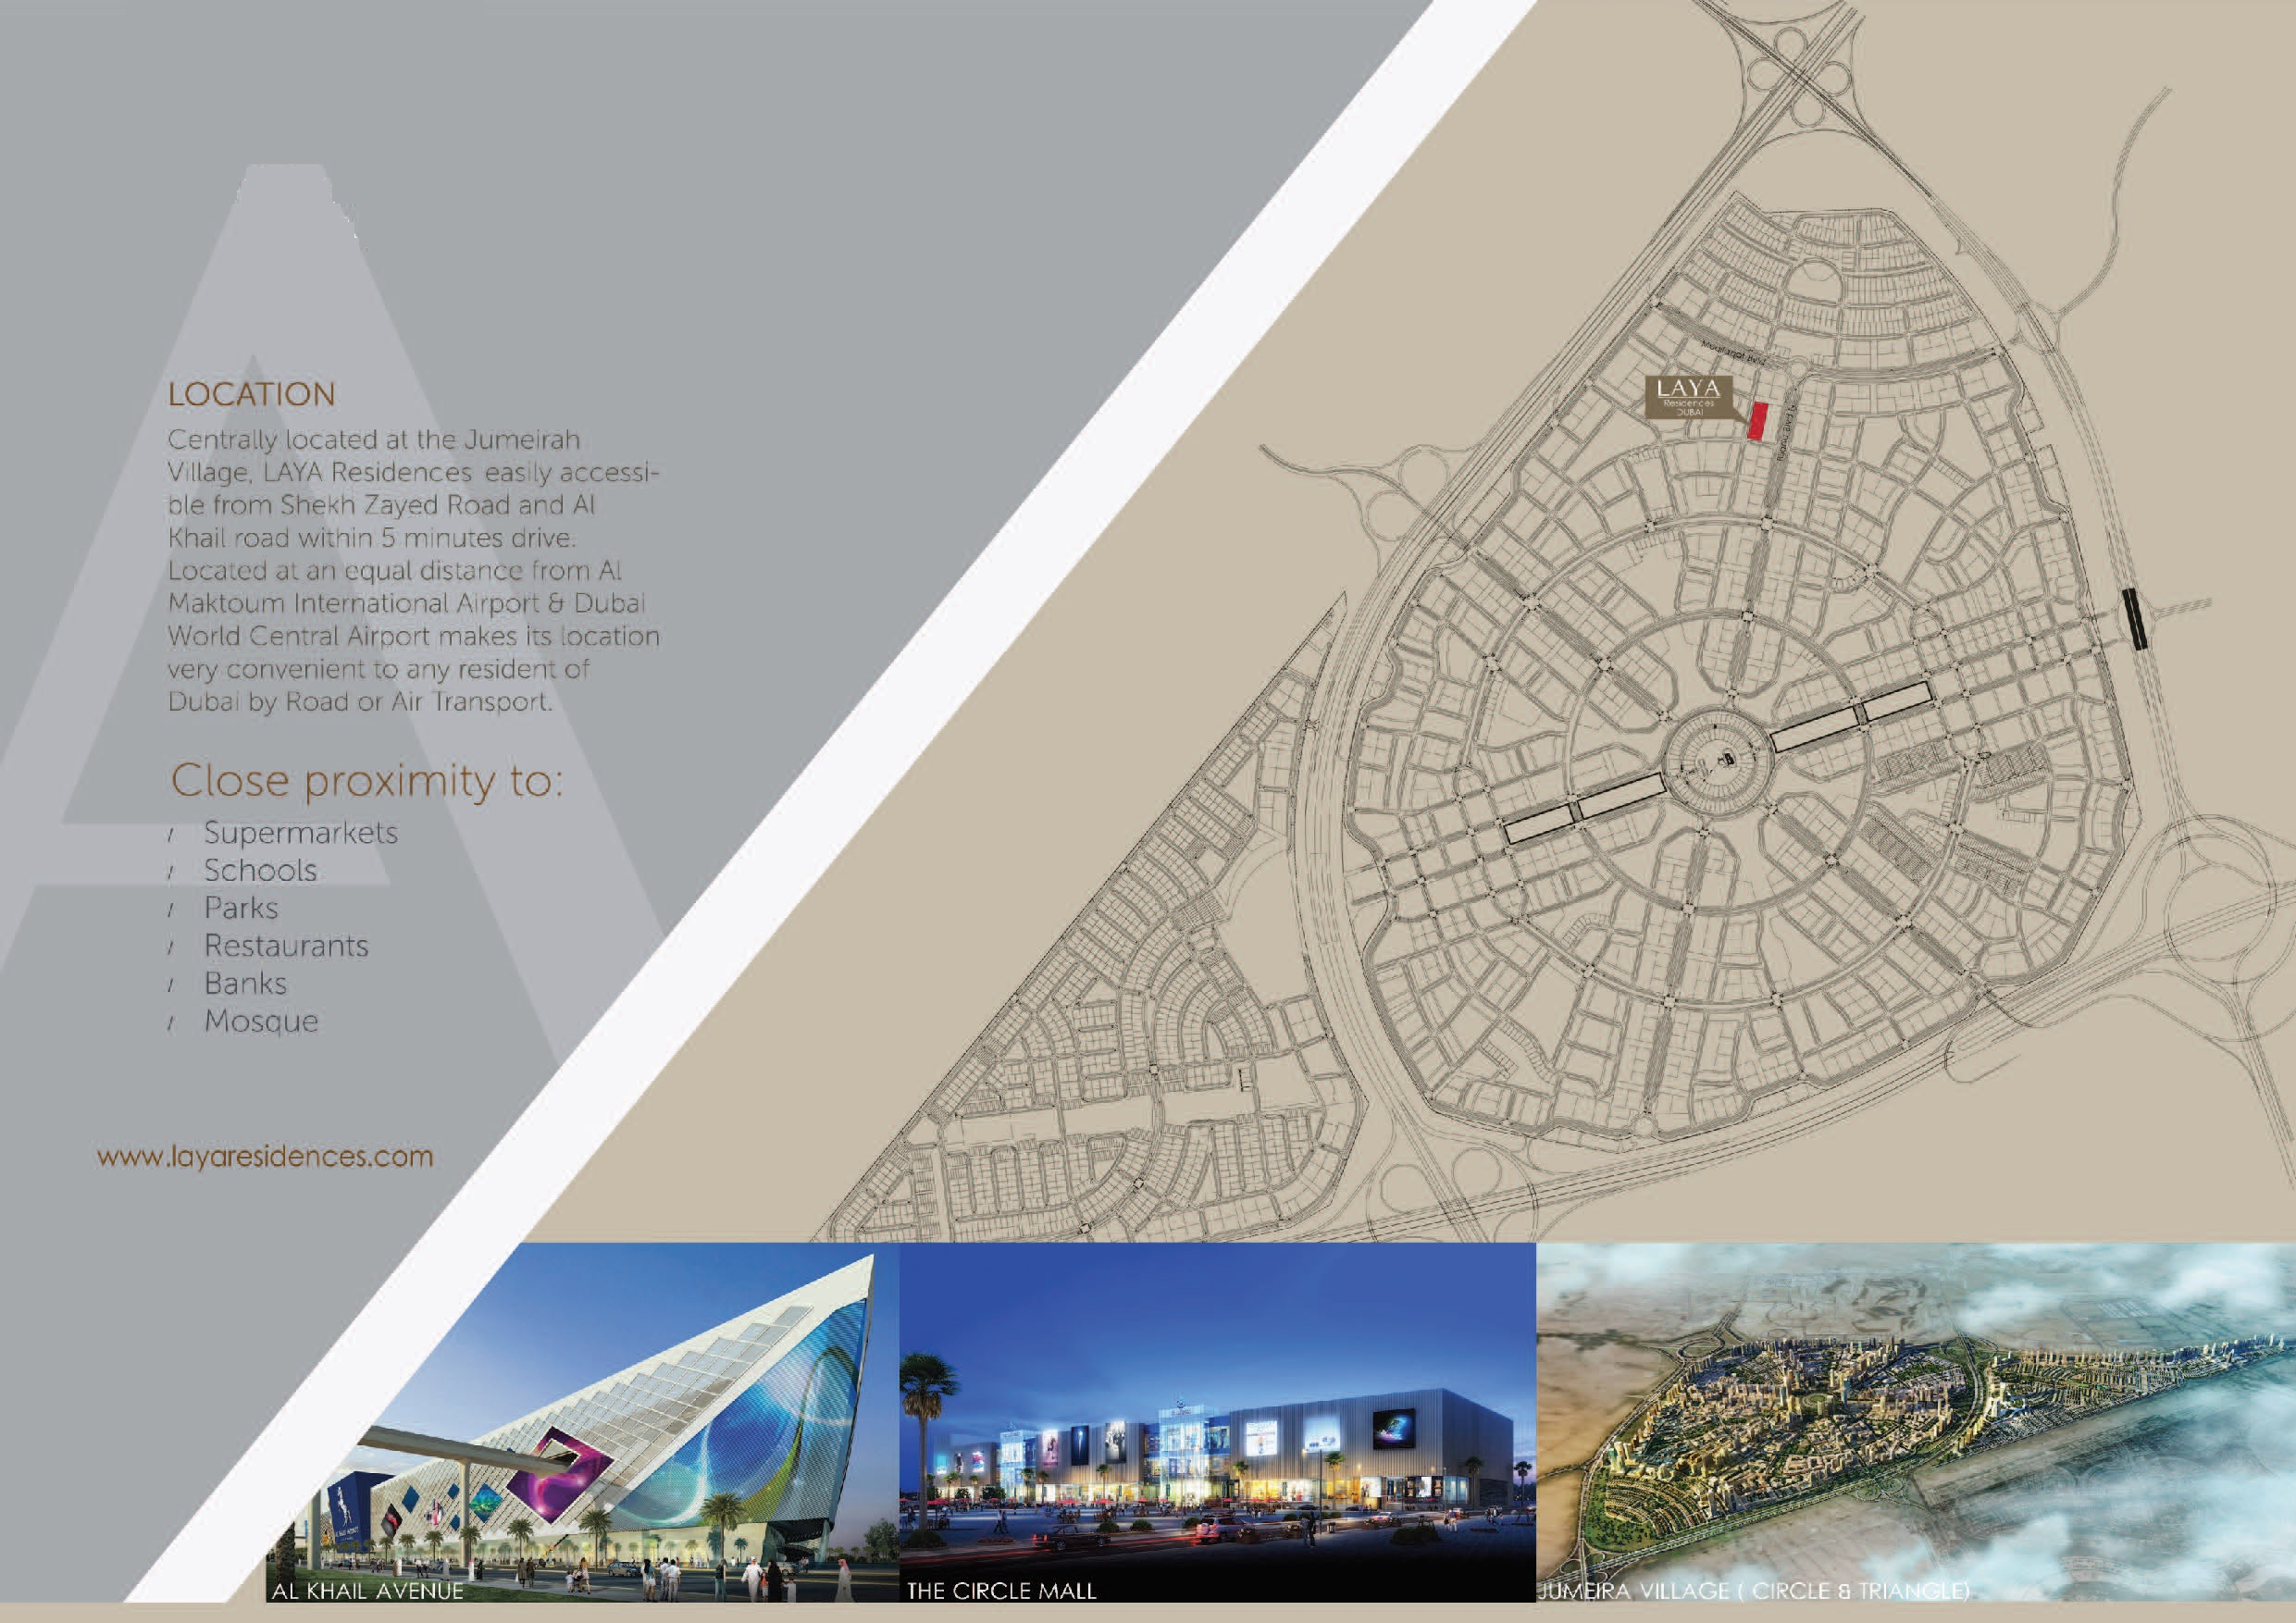 laya residences location image6